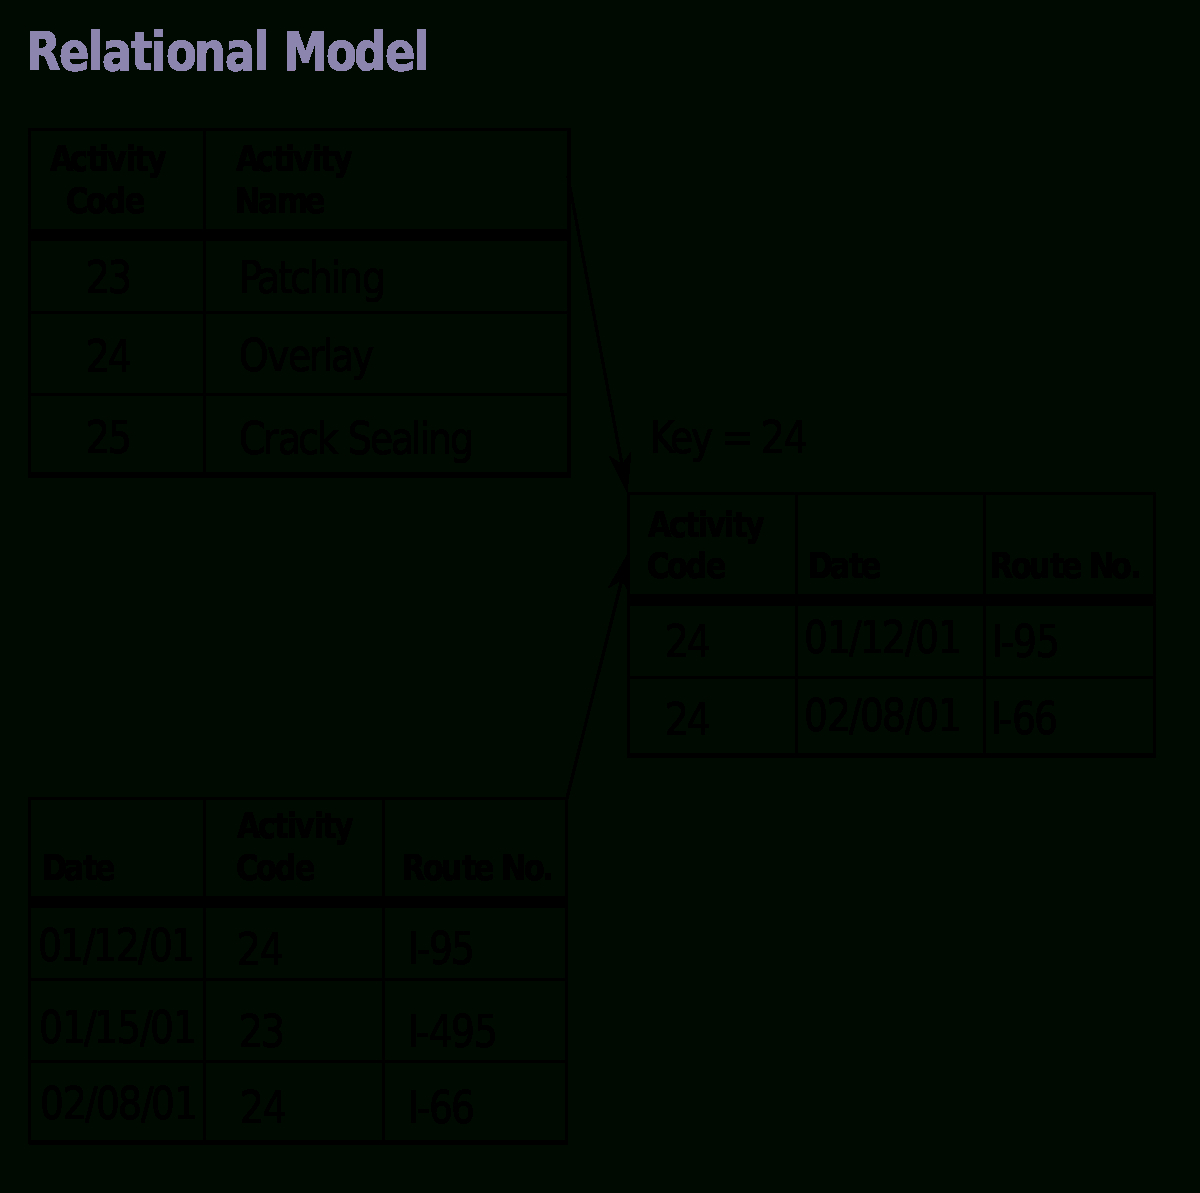 Relational Model - Wikipedia intended for Relational Database Schema Diagram